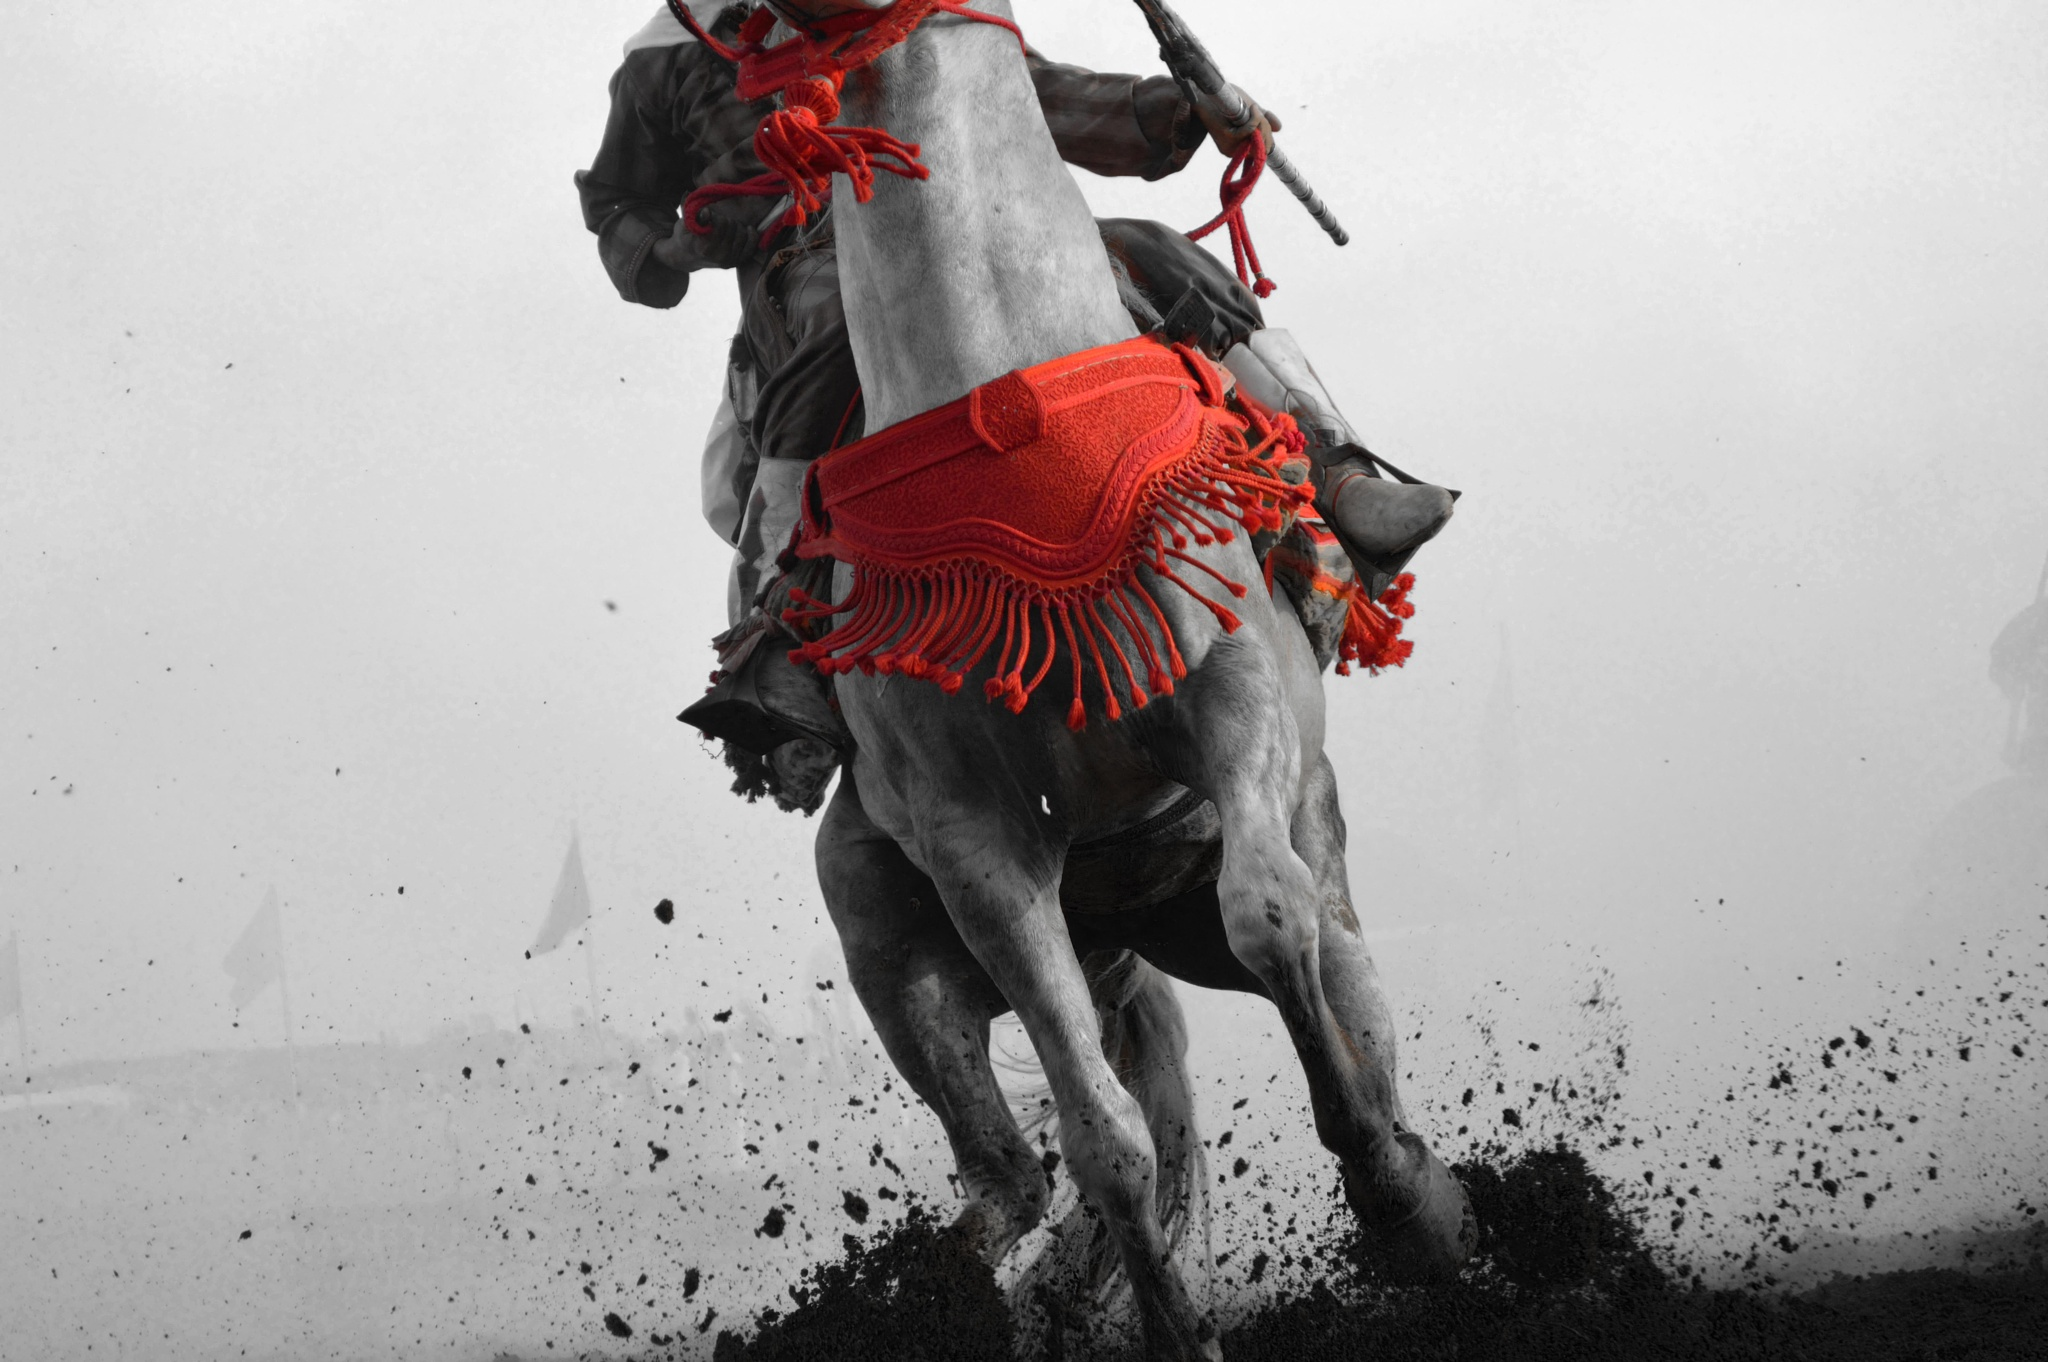 horse power by Brahim Echcharqy